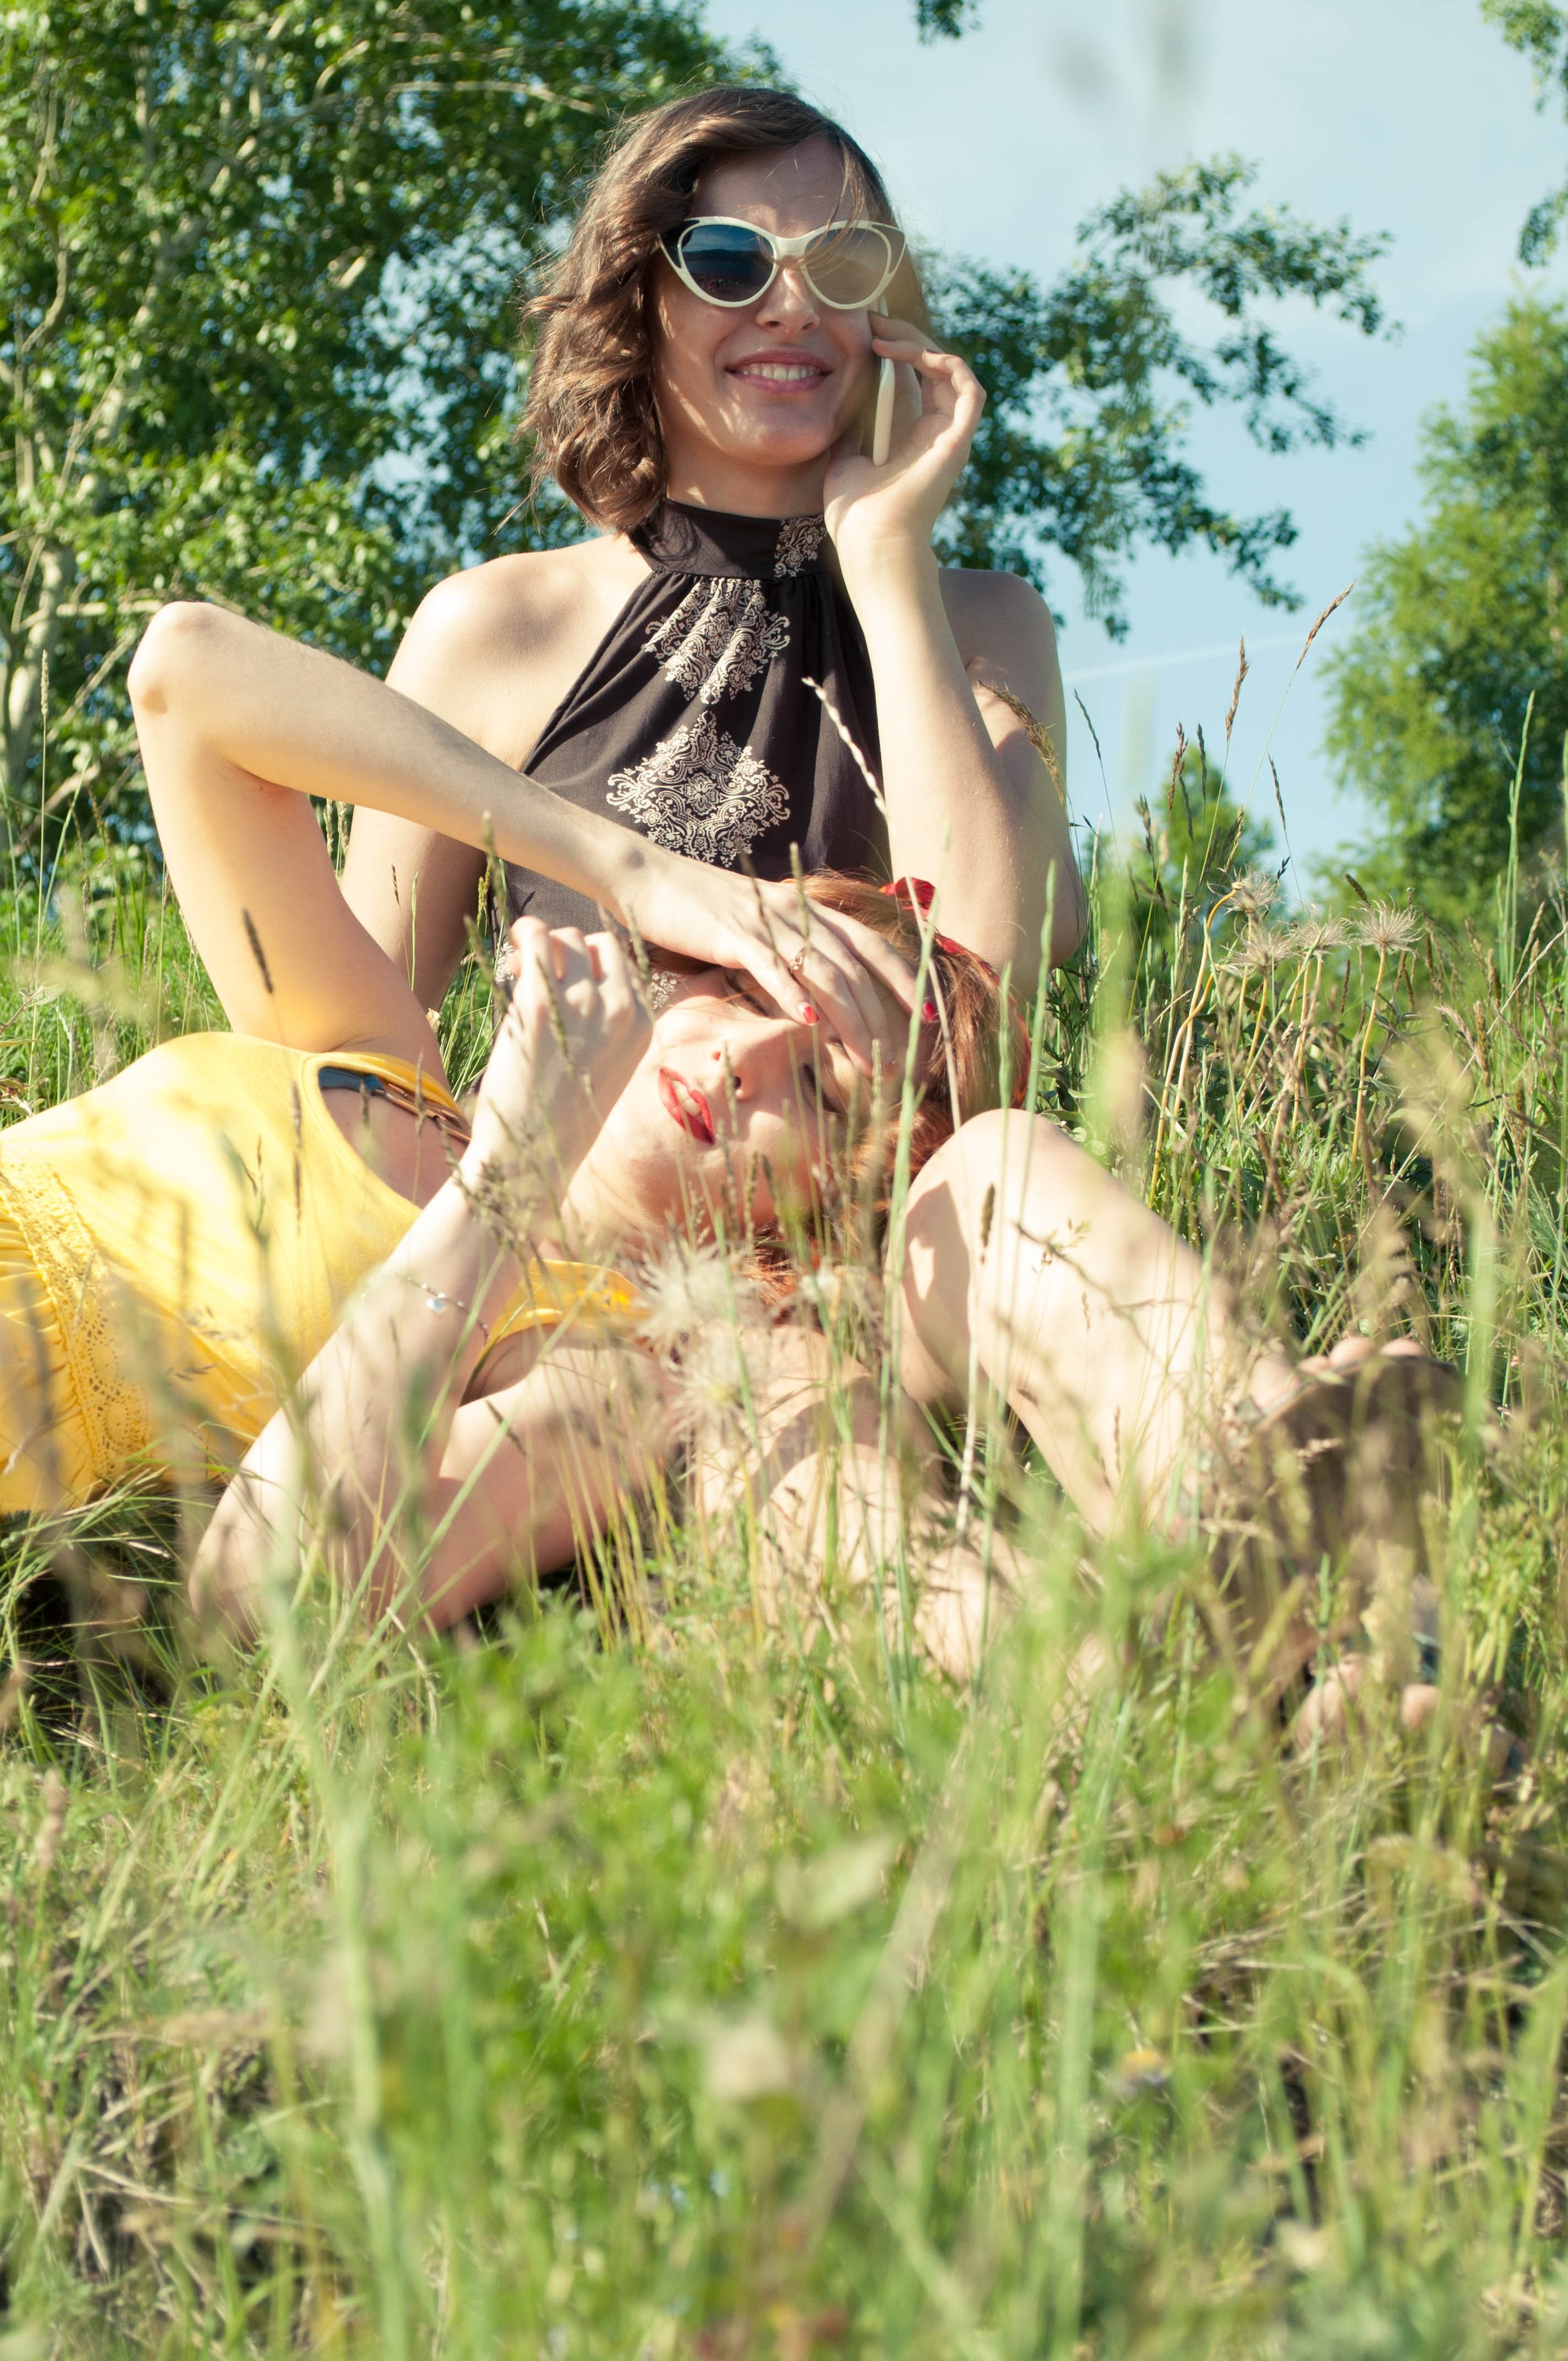 girls-380619.jpg